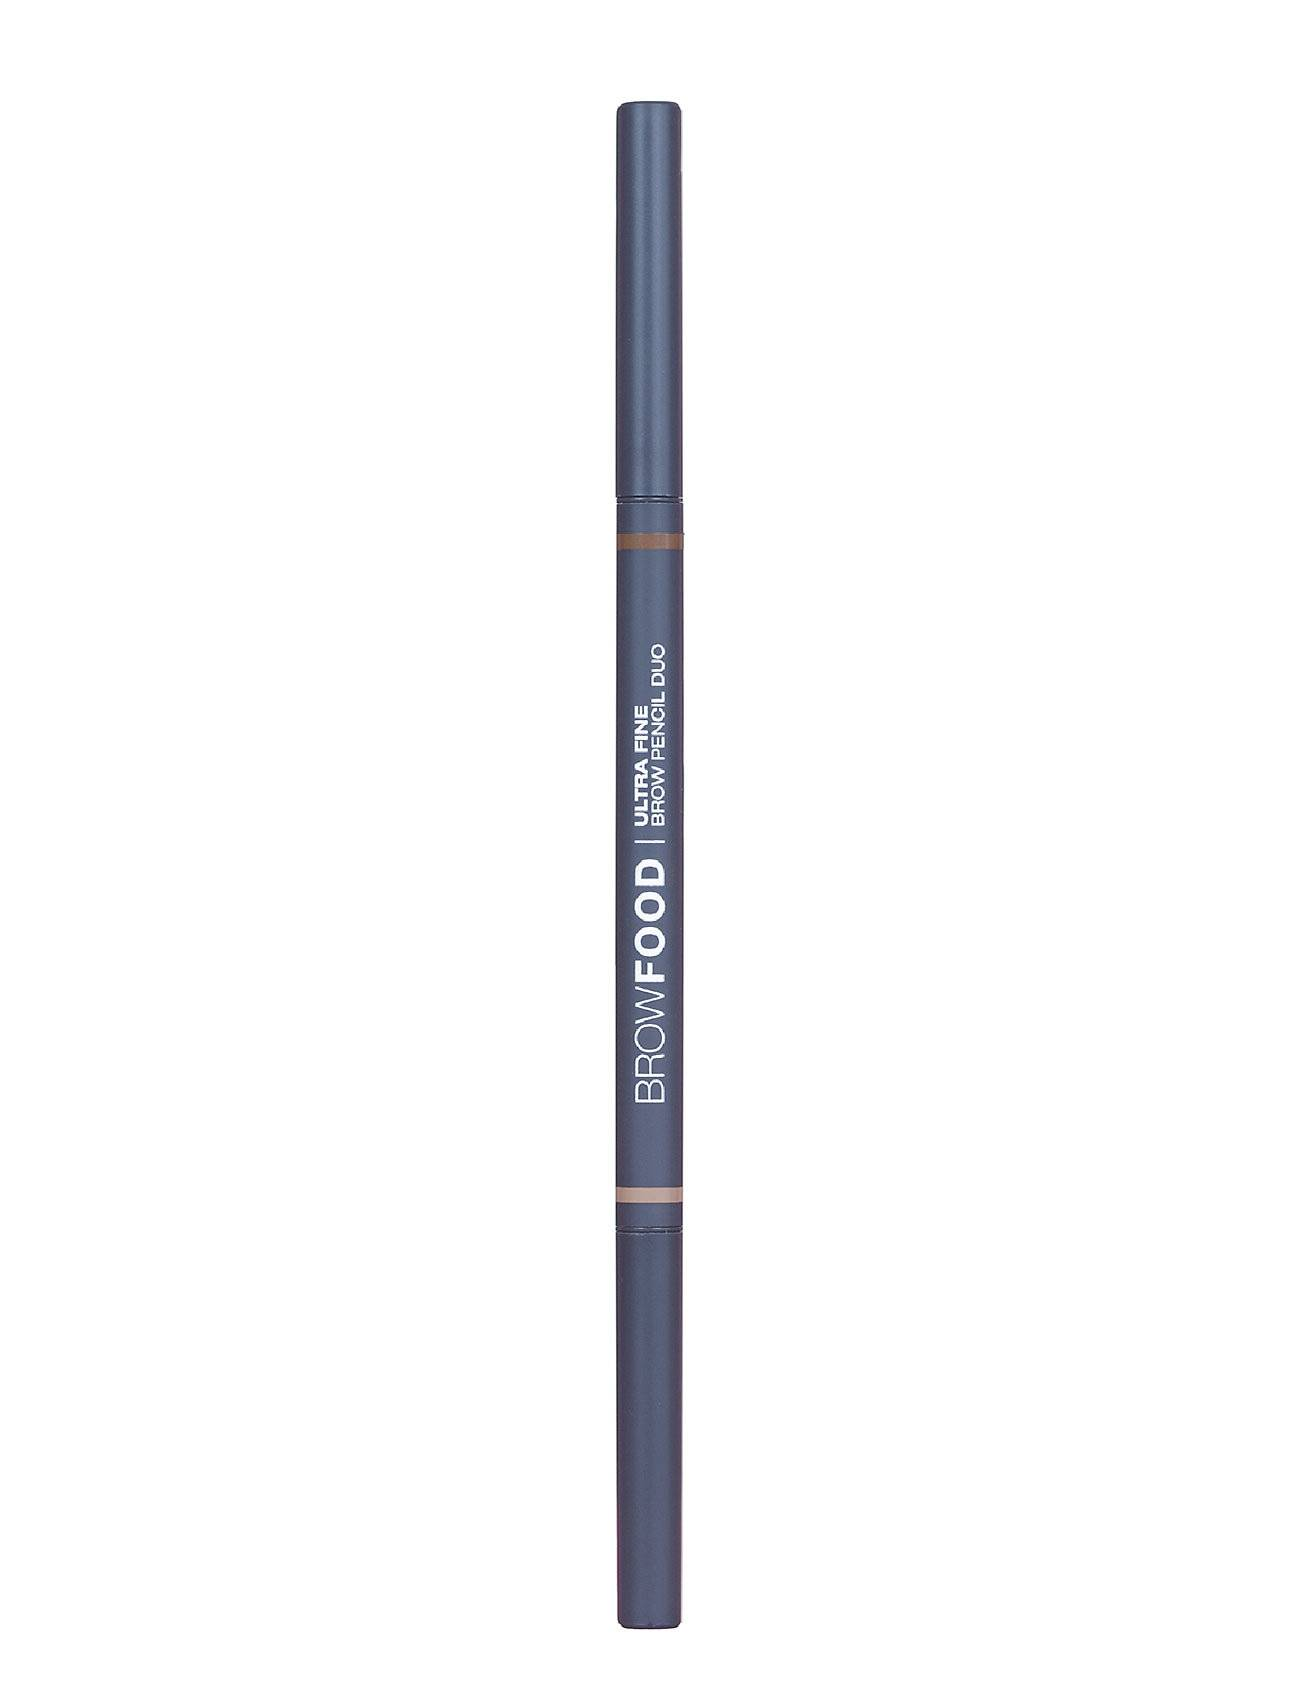 LashFood Browfood Ultra Fine Pencil Duo Kulmakynä Meikki Ruskea LashFood